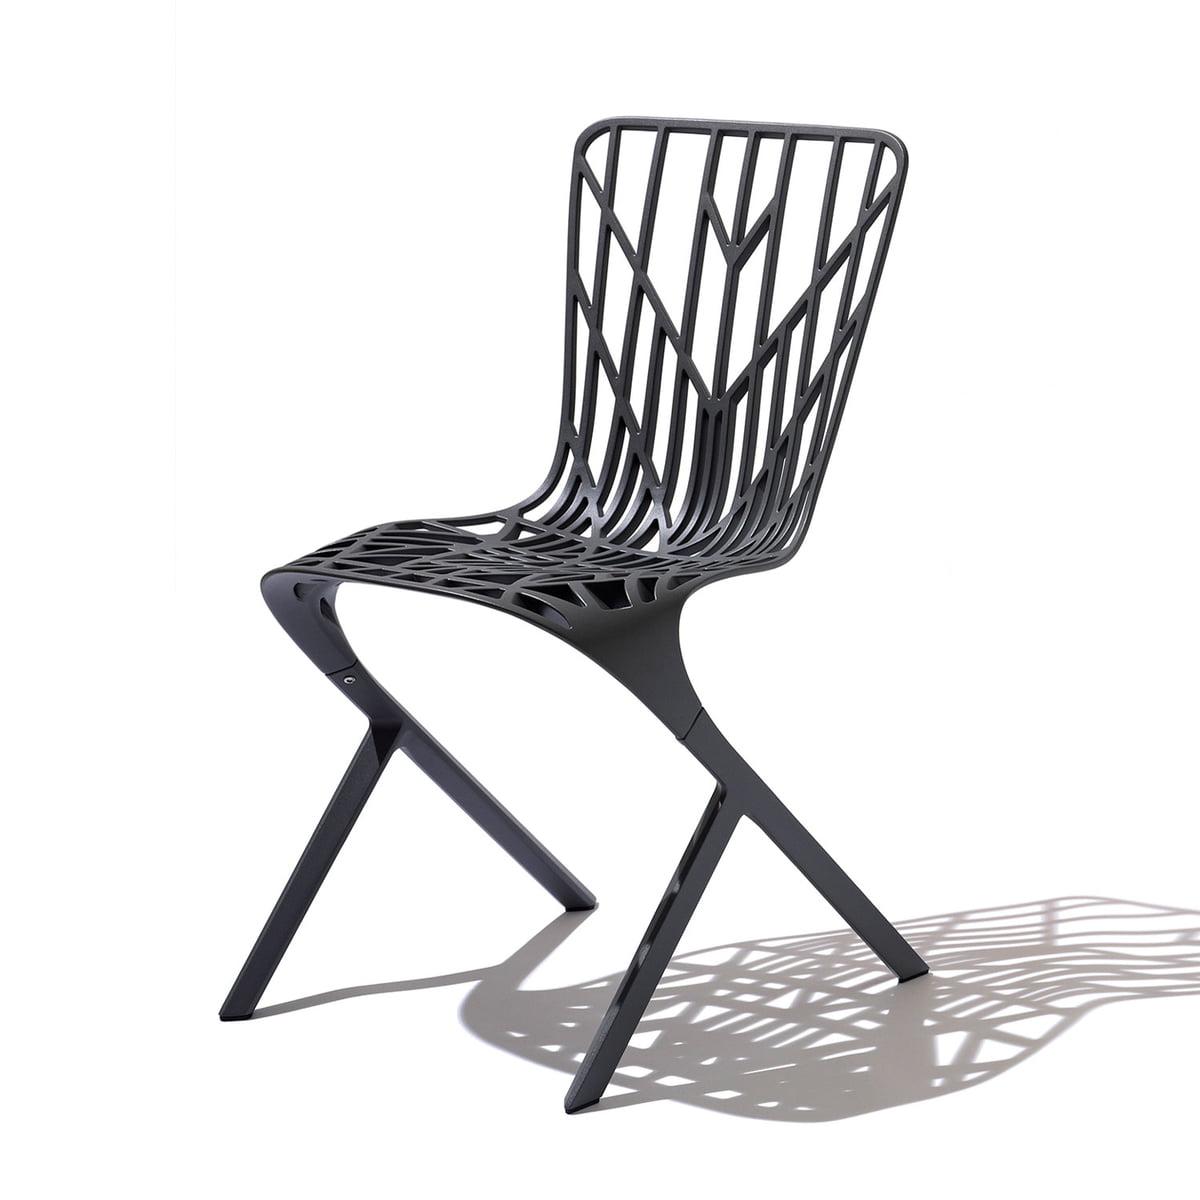 Chaise washington skeleton chair de knoll for Chaise knoll